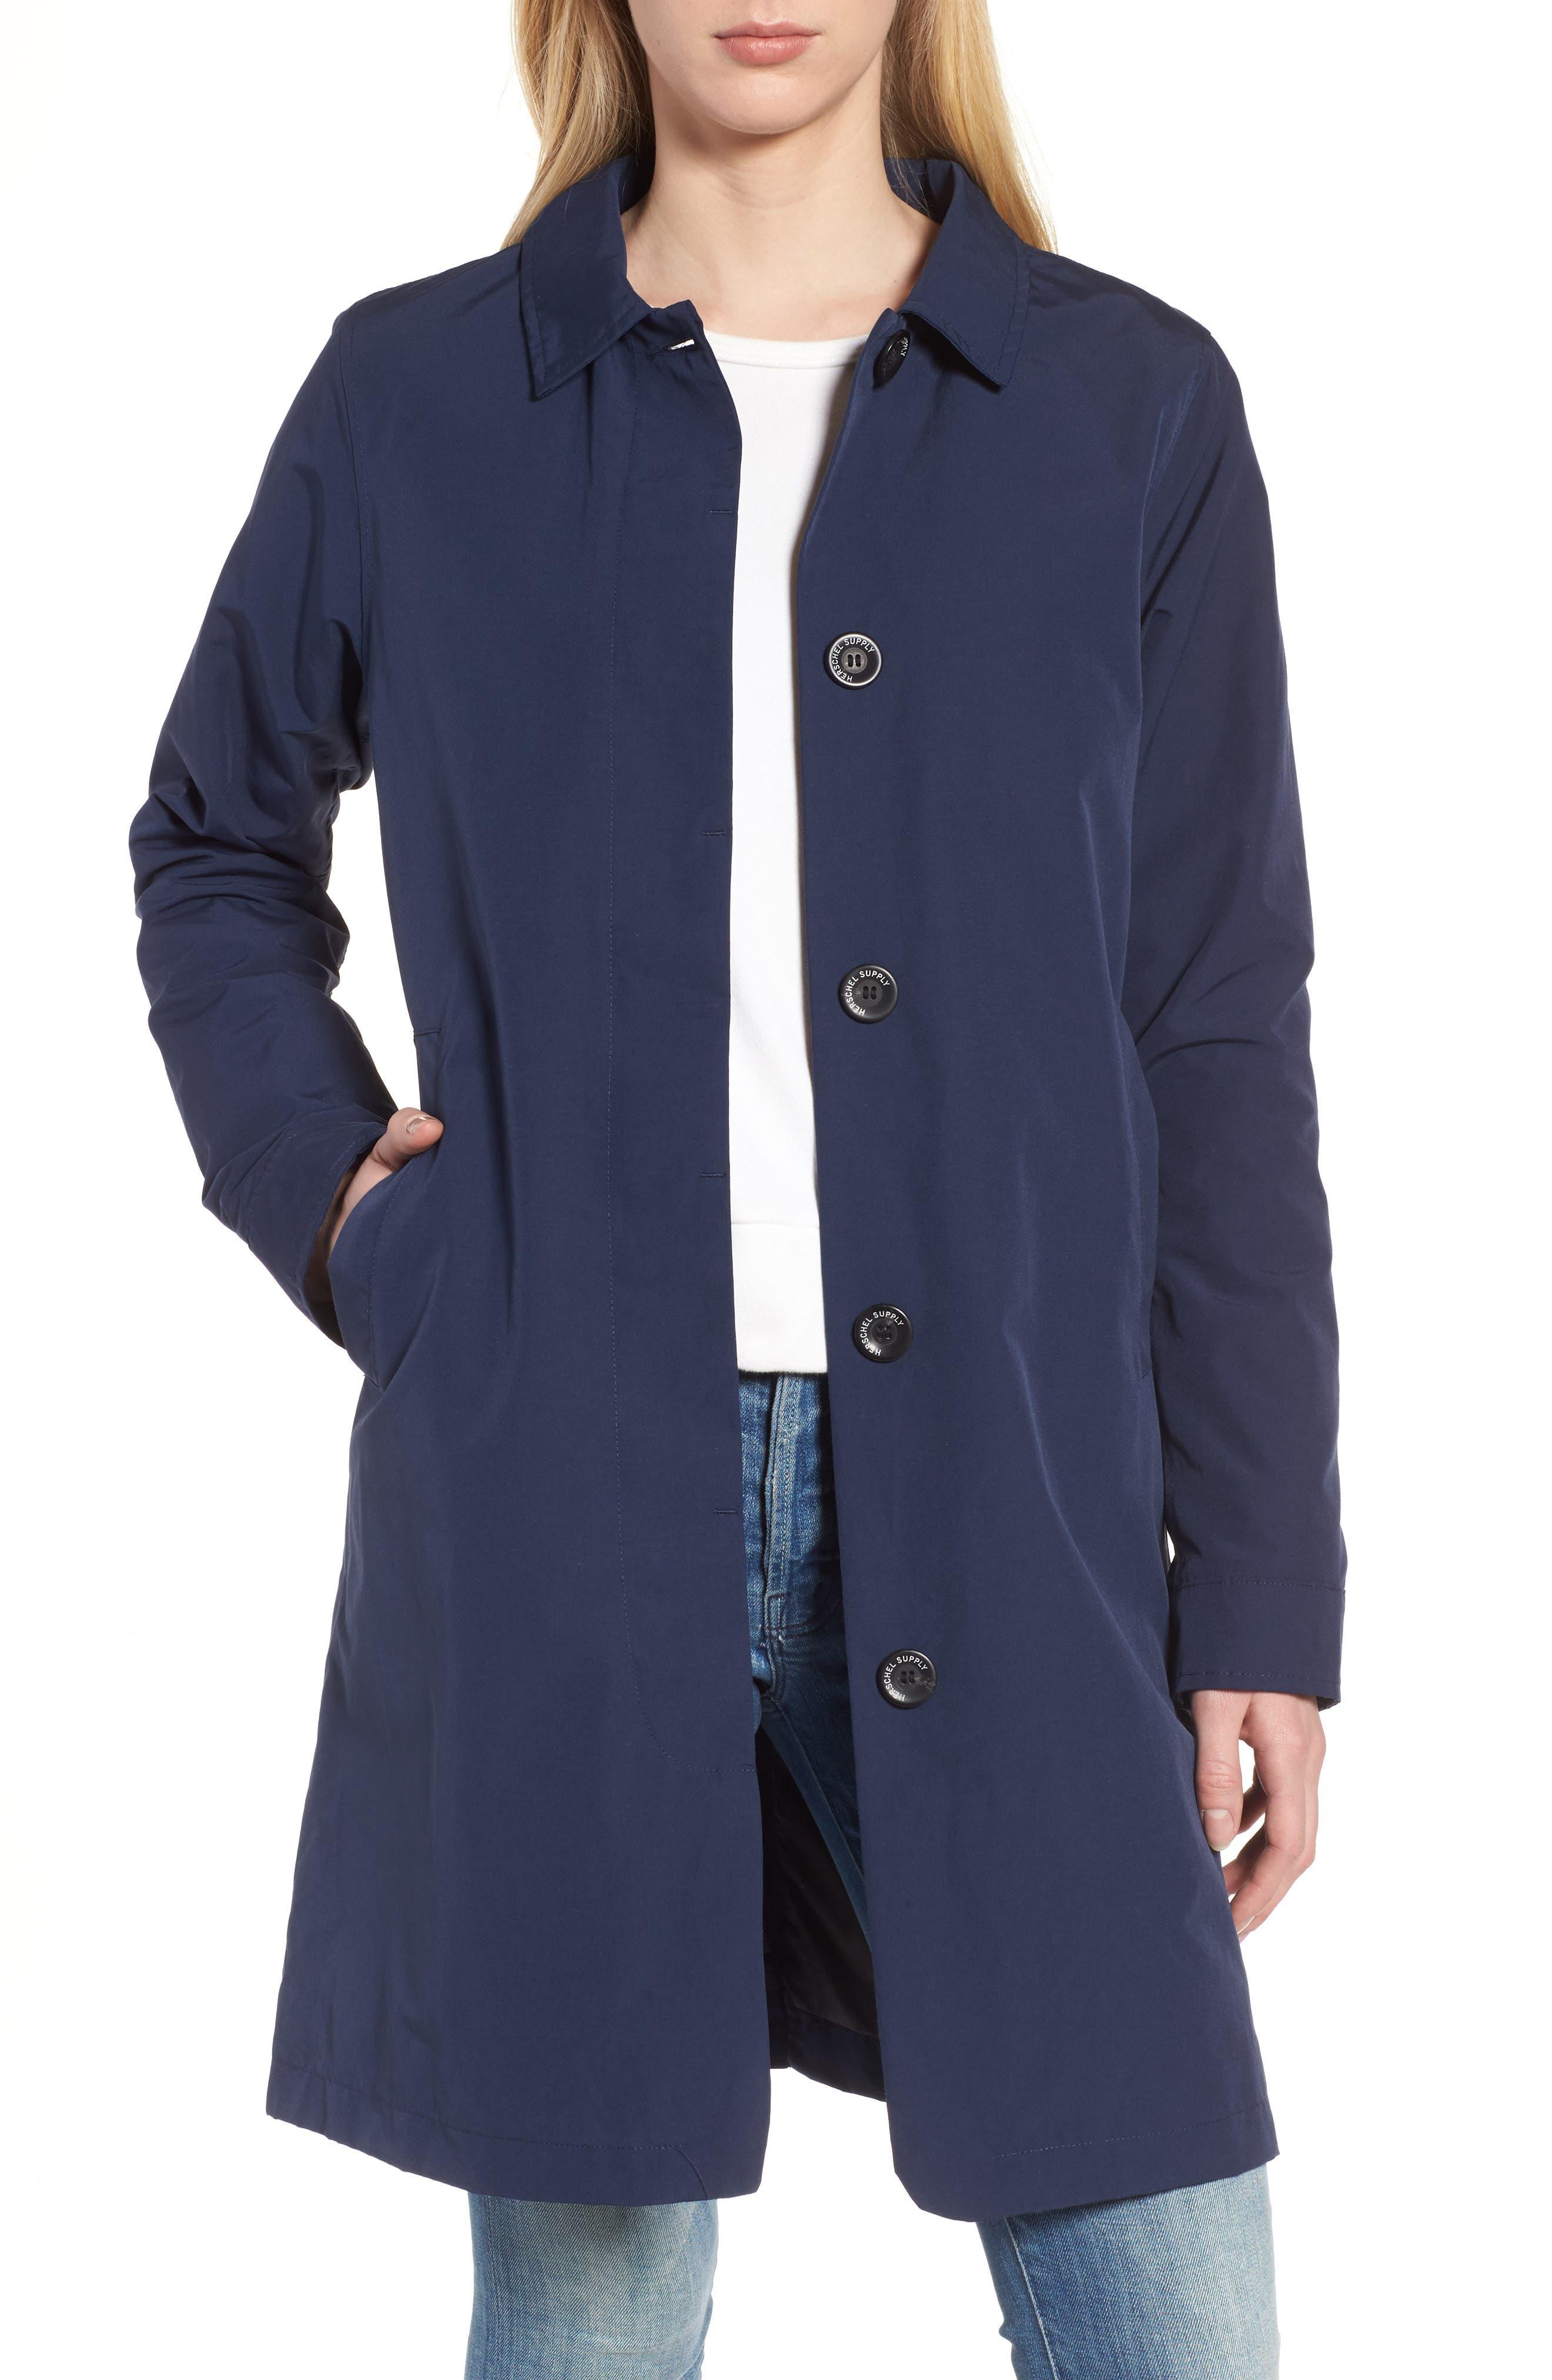 Alternate Image 1 Selected - Herschel Supply Co. Mac Jacket